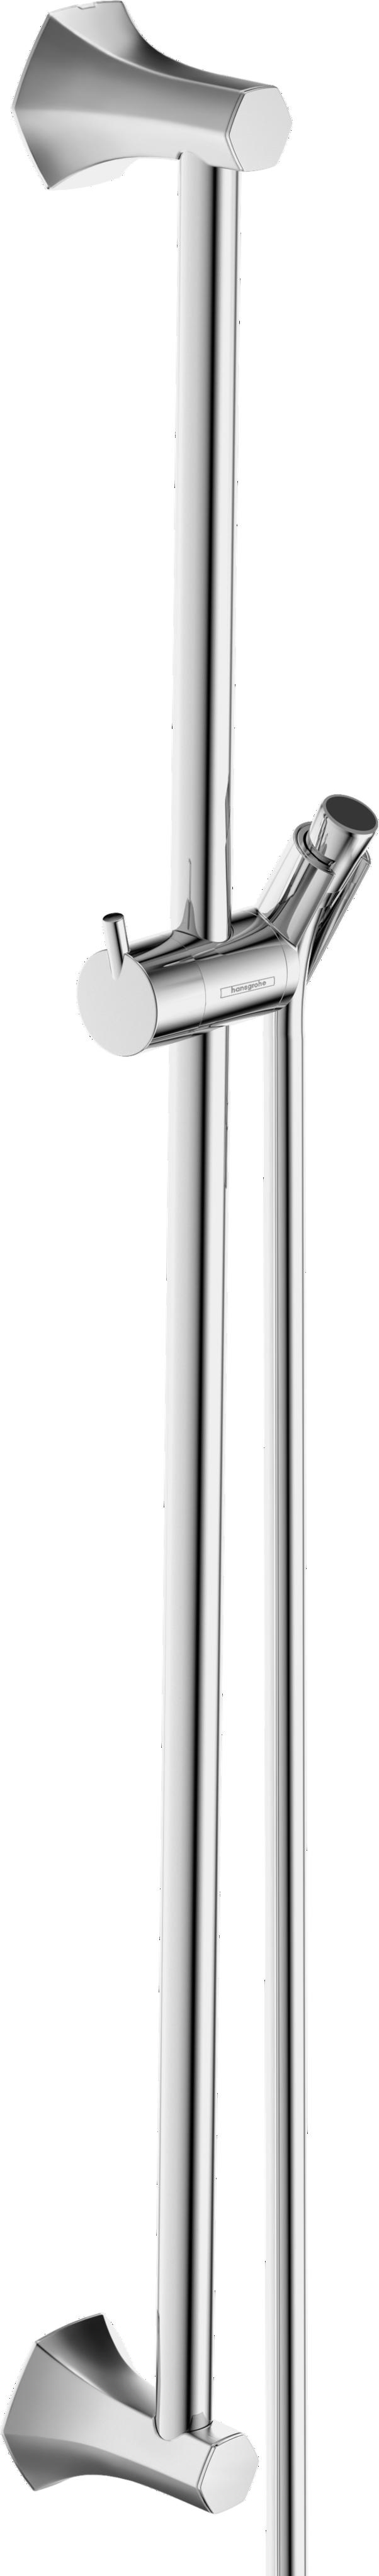 PROPLUS 2489384 Shower Arm Escutcheon Chrome